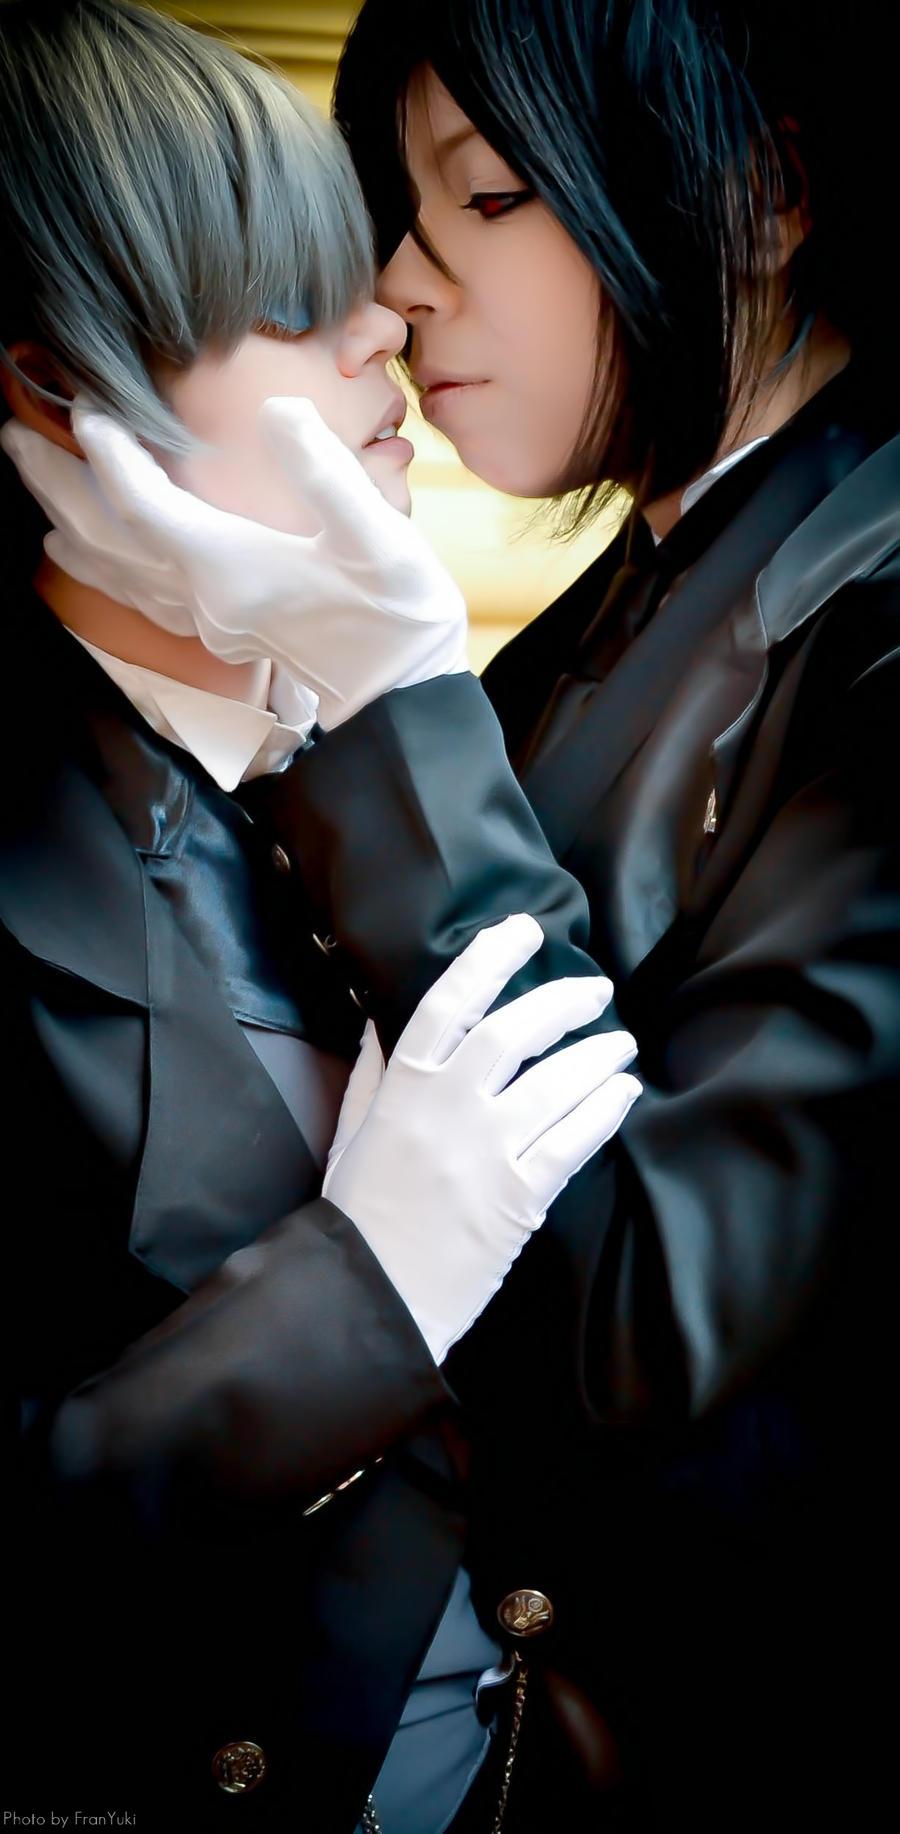 Kuroshitsuji: Butlers in fan-service by NeeYumi